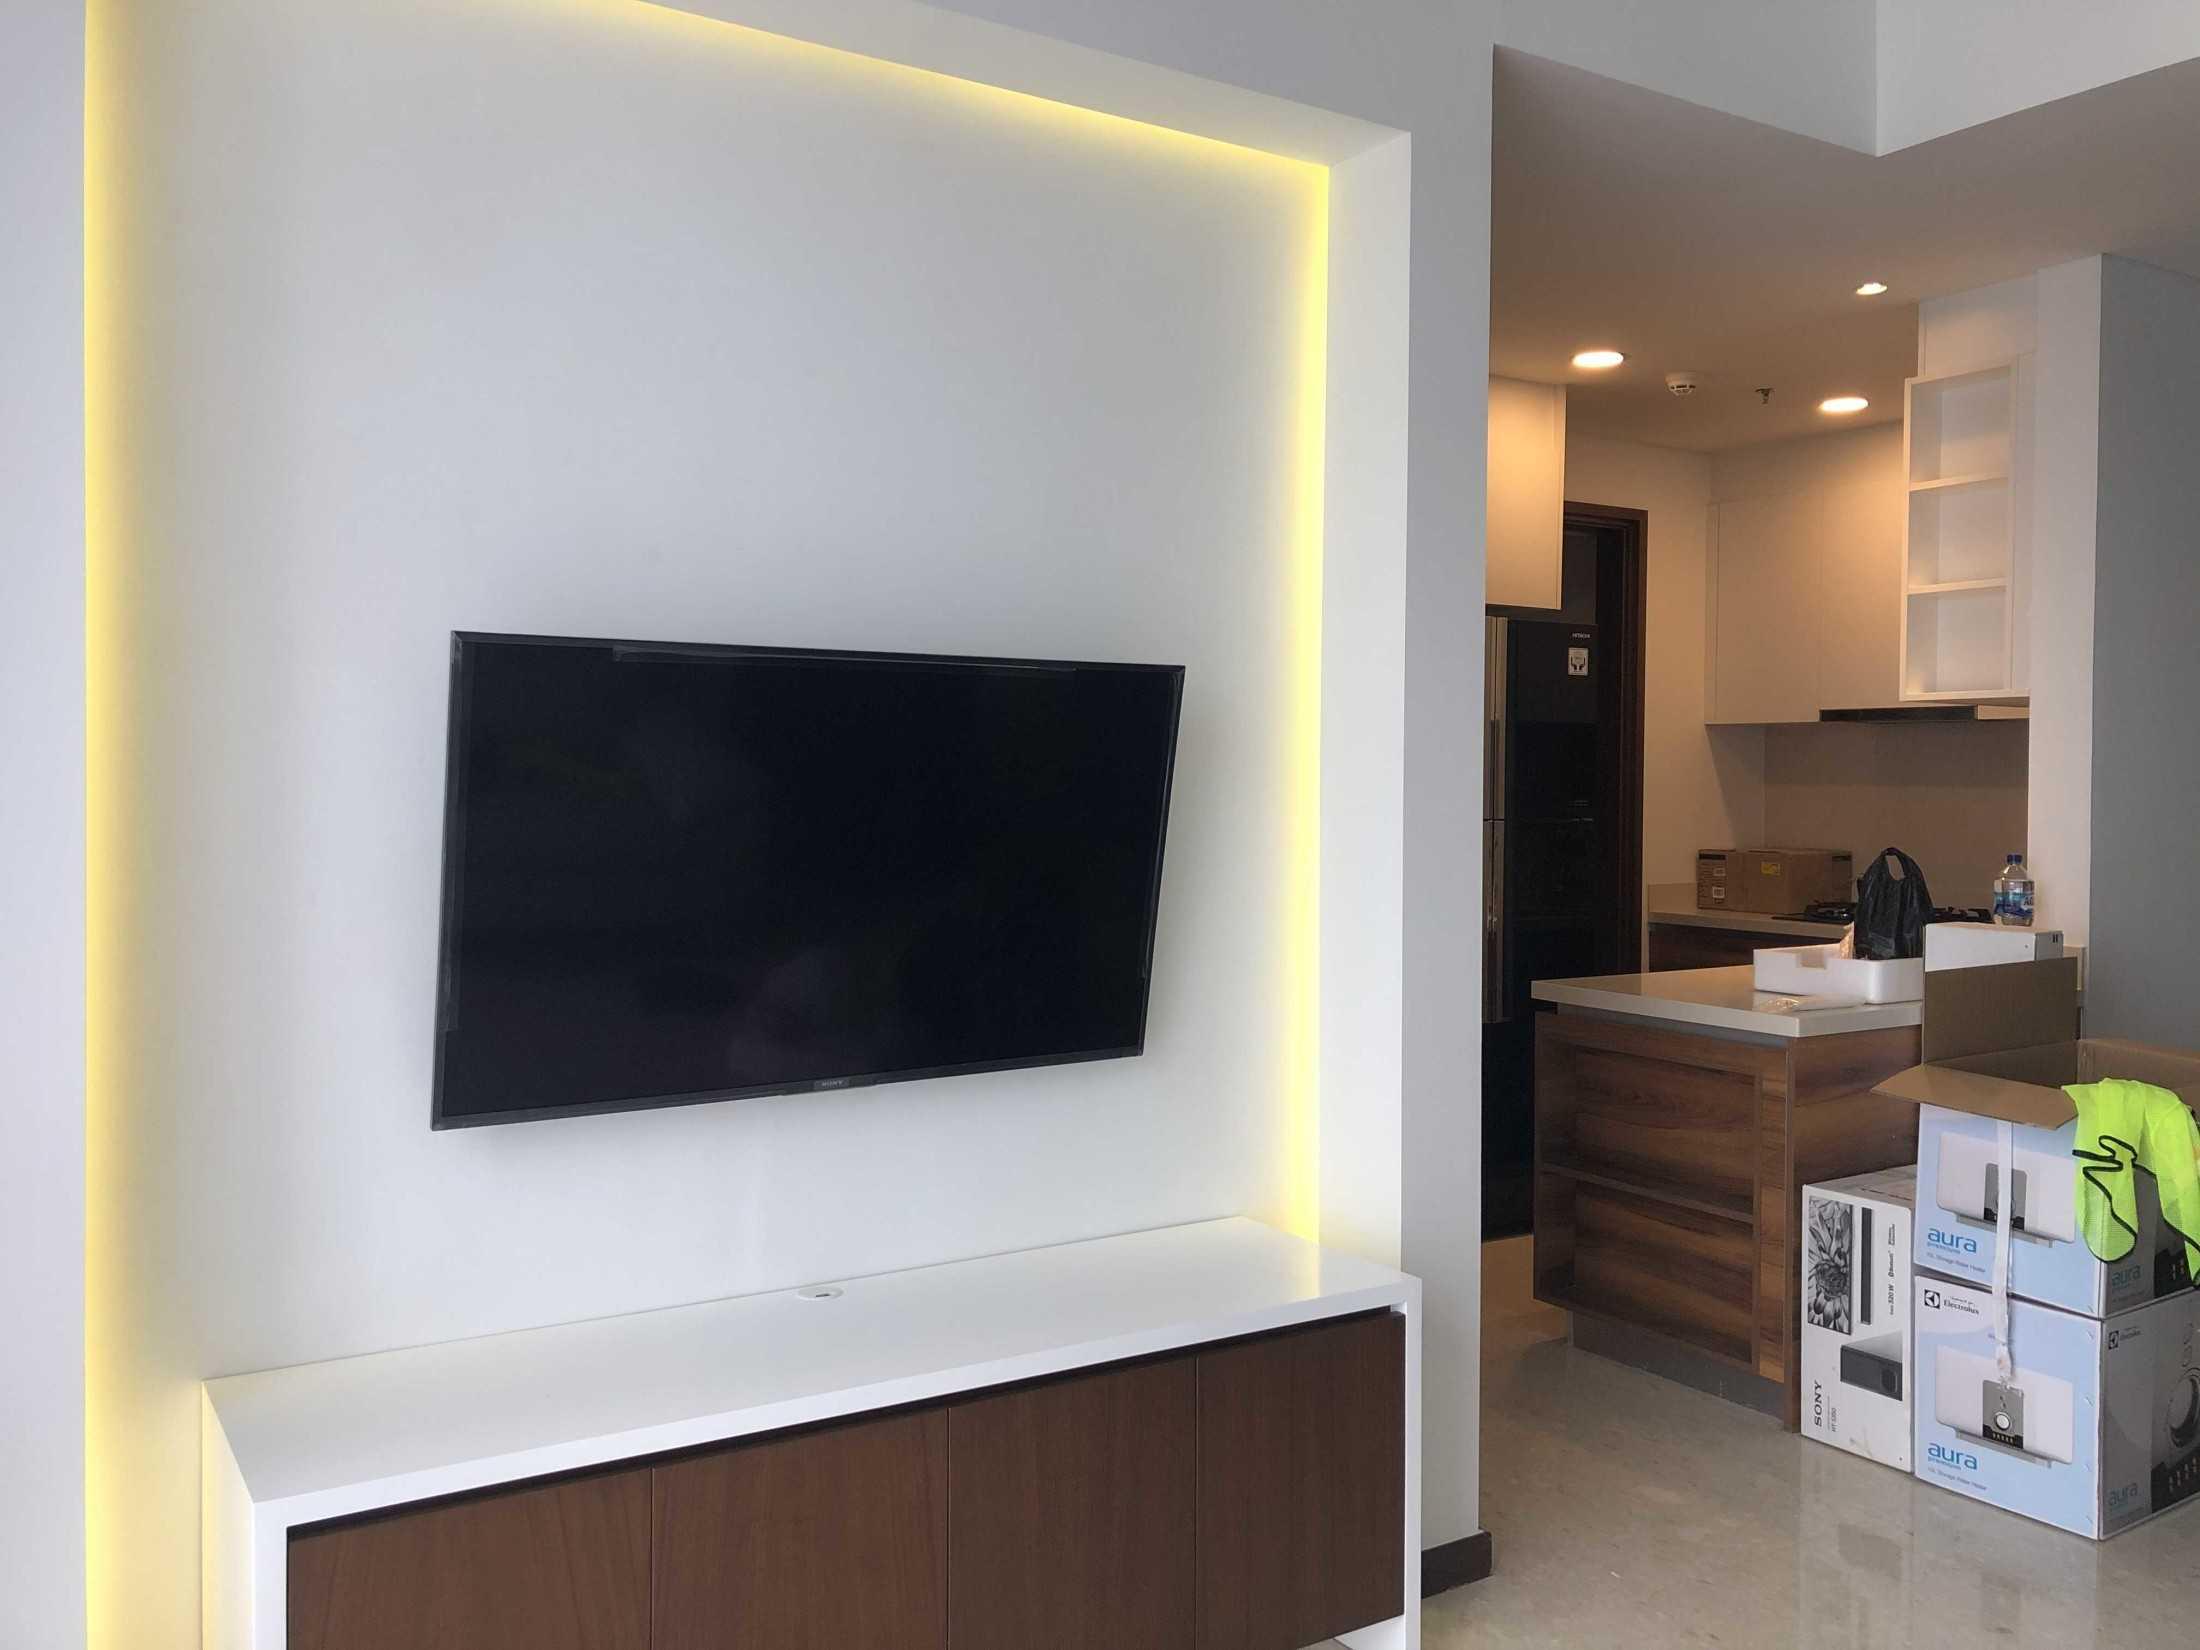 Loop Design/production Wv Apartment Sampora, Kec. Cisauk, Tangerang, Banten 15345, Indonesia Sampora, Kec. Cisauk, Tangerang, Banten 15345, Indonesia Loop-Design-Production-Mrmrs-William-Apartment  120627